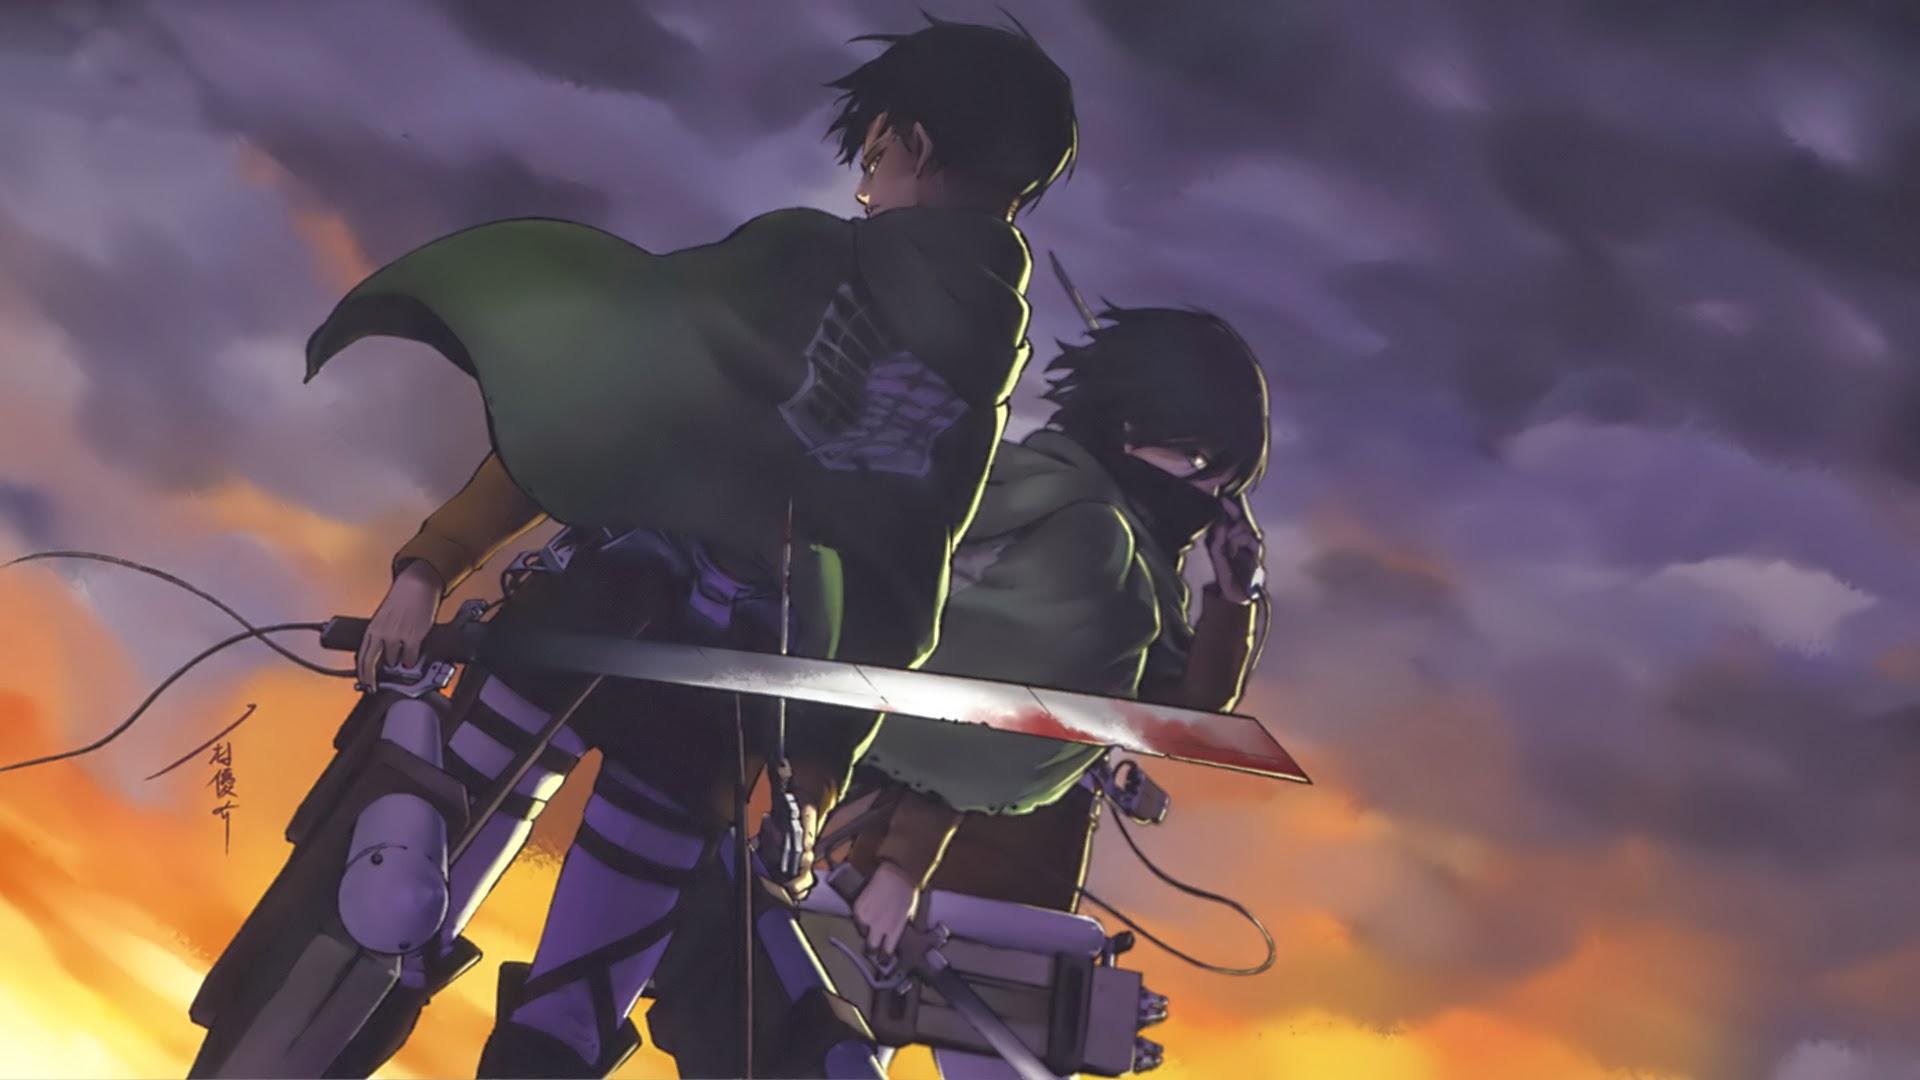 attack on titan shingeki no kyojin anime hd wallpaper 1920x1080 7s 1920x1080